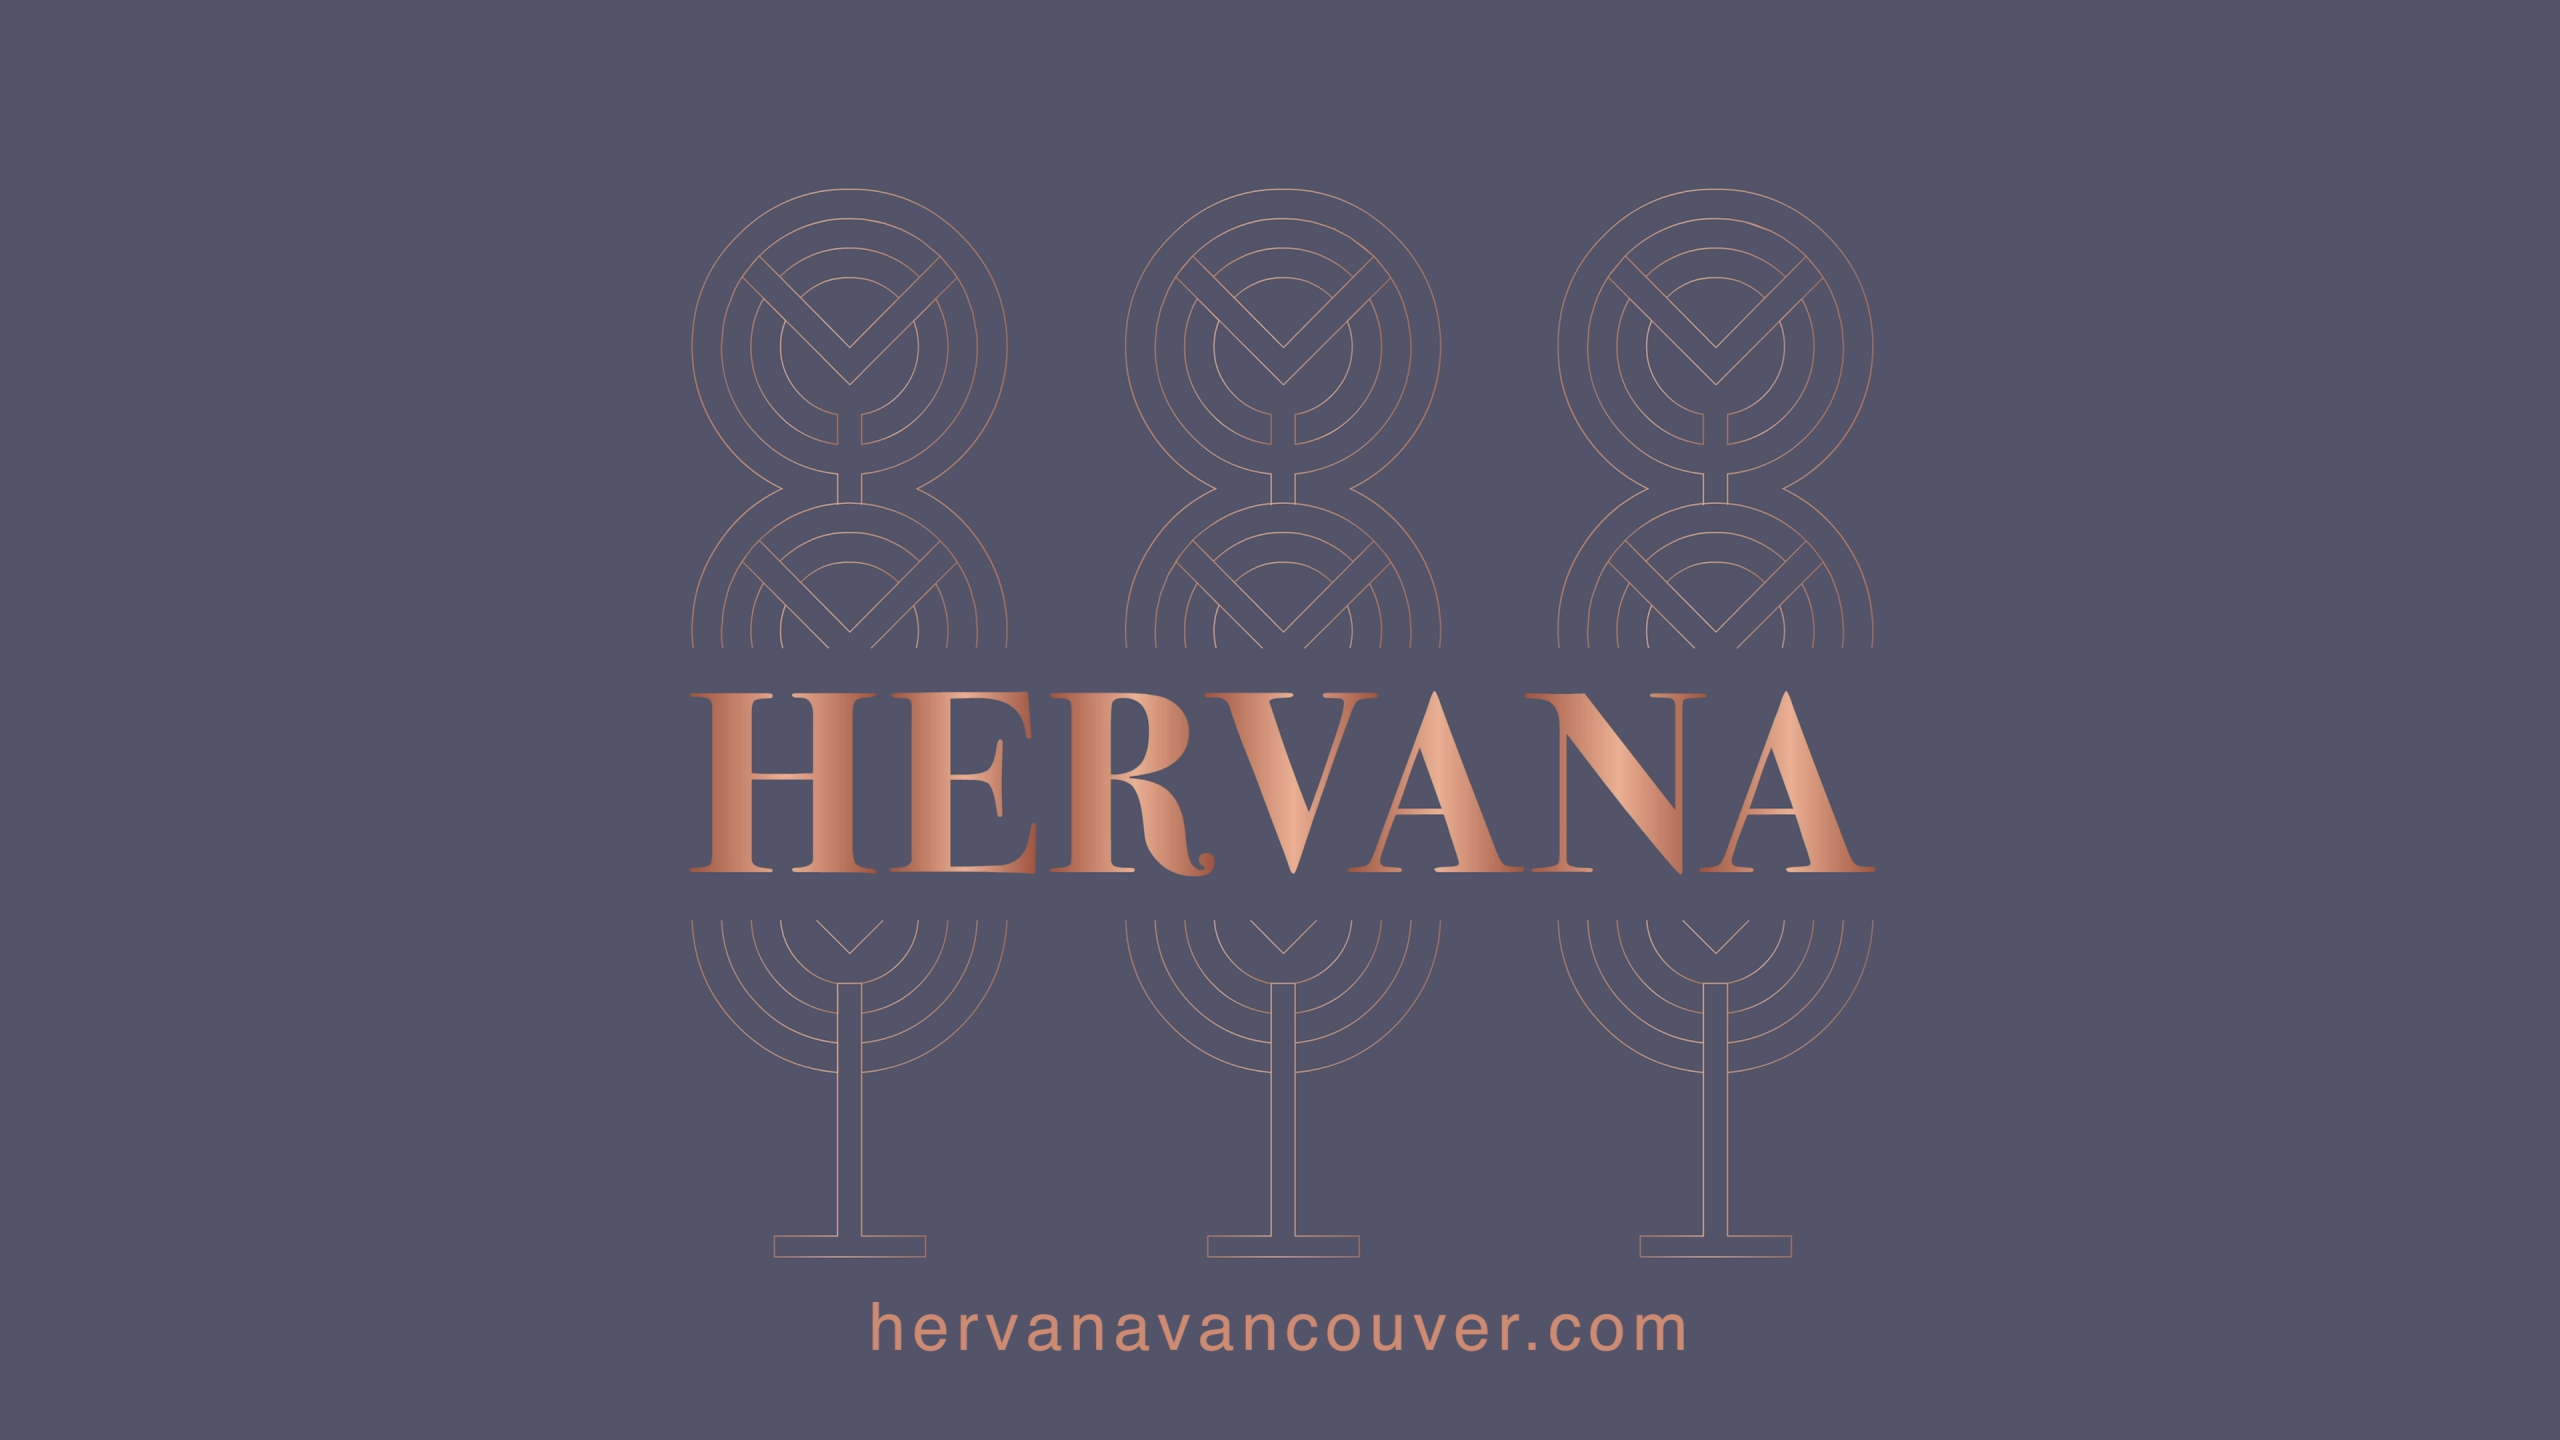 Hervana Coworking Space logo